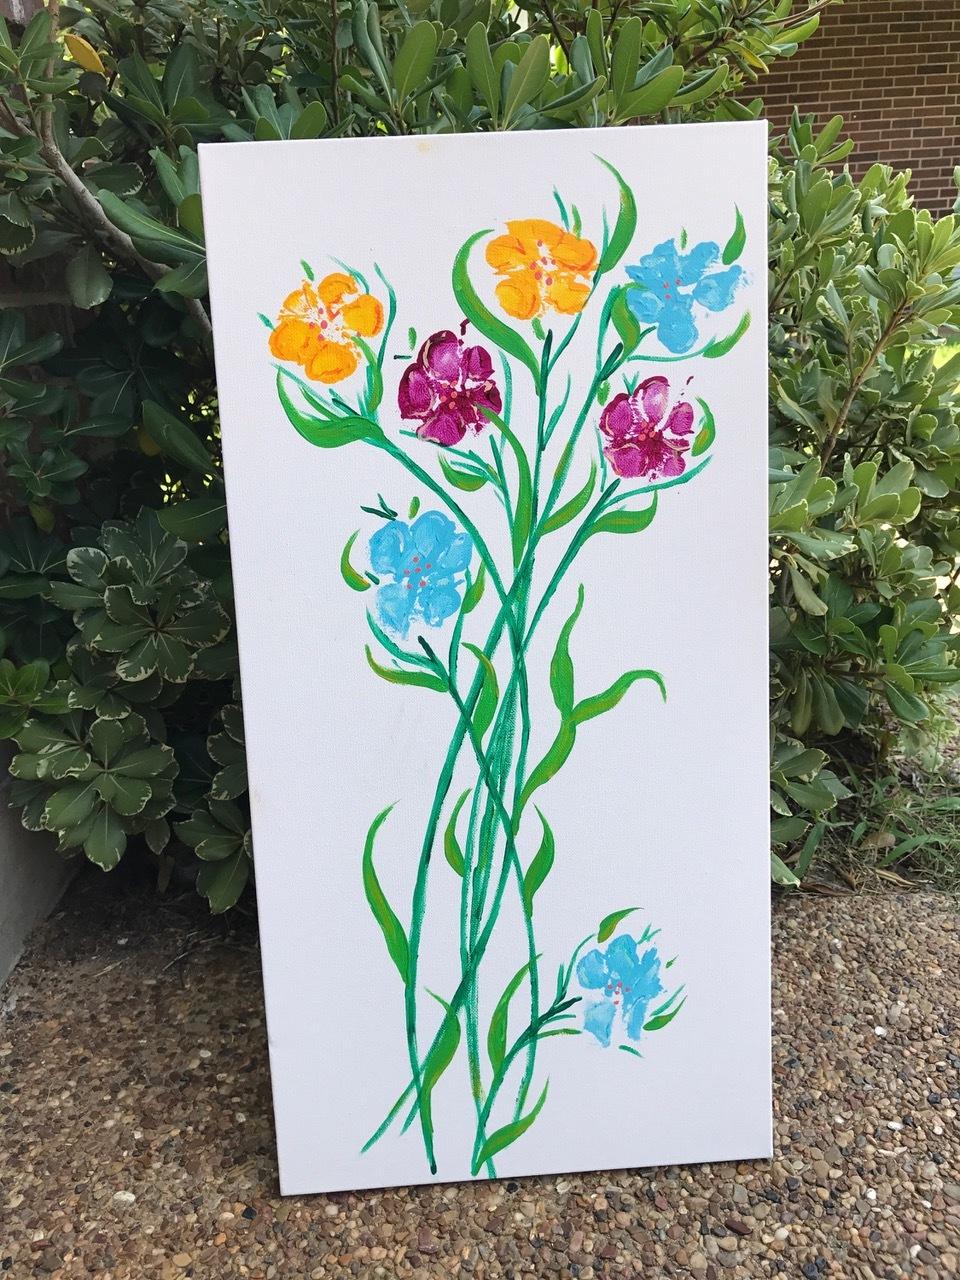 Paw Print Flowers. By Carolina Orsi, M1.